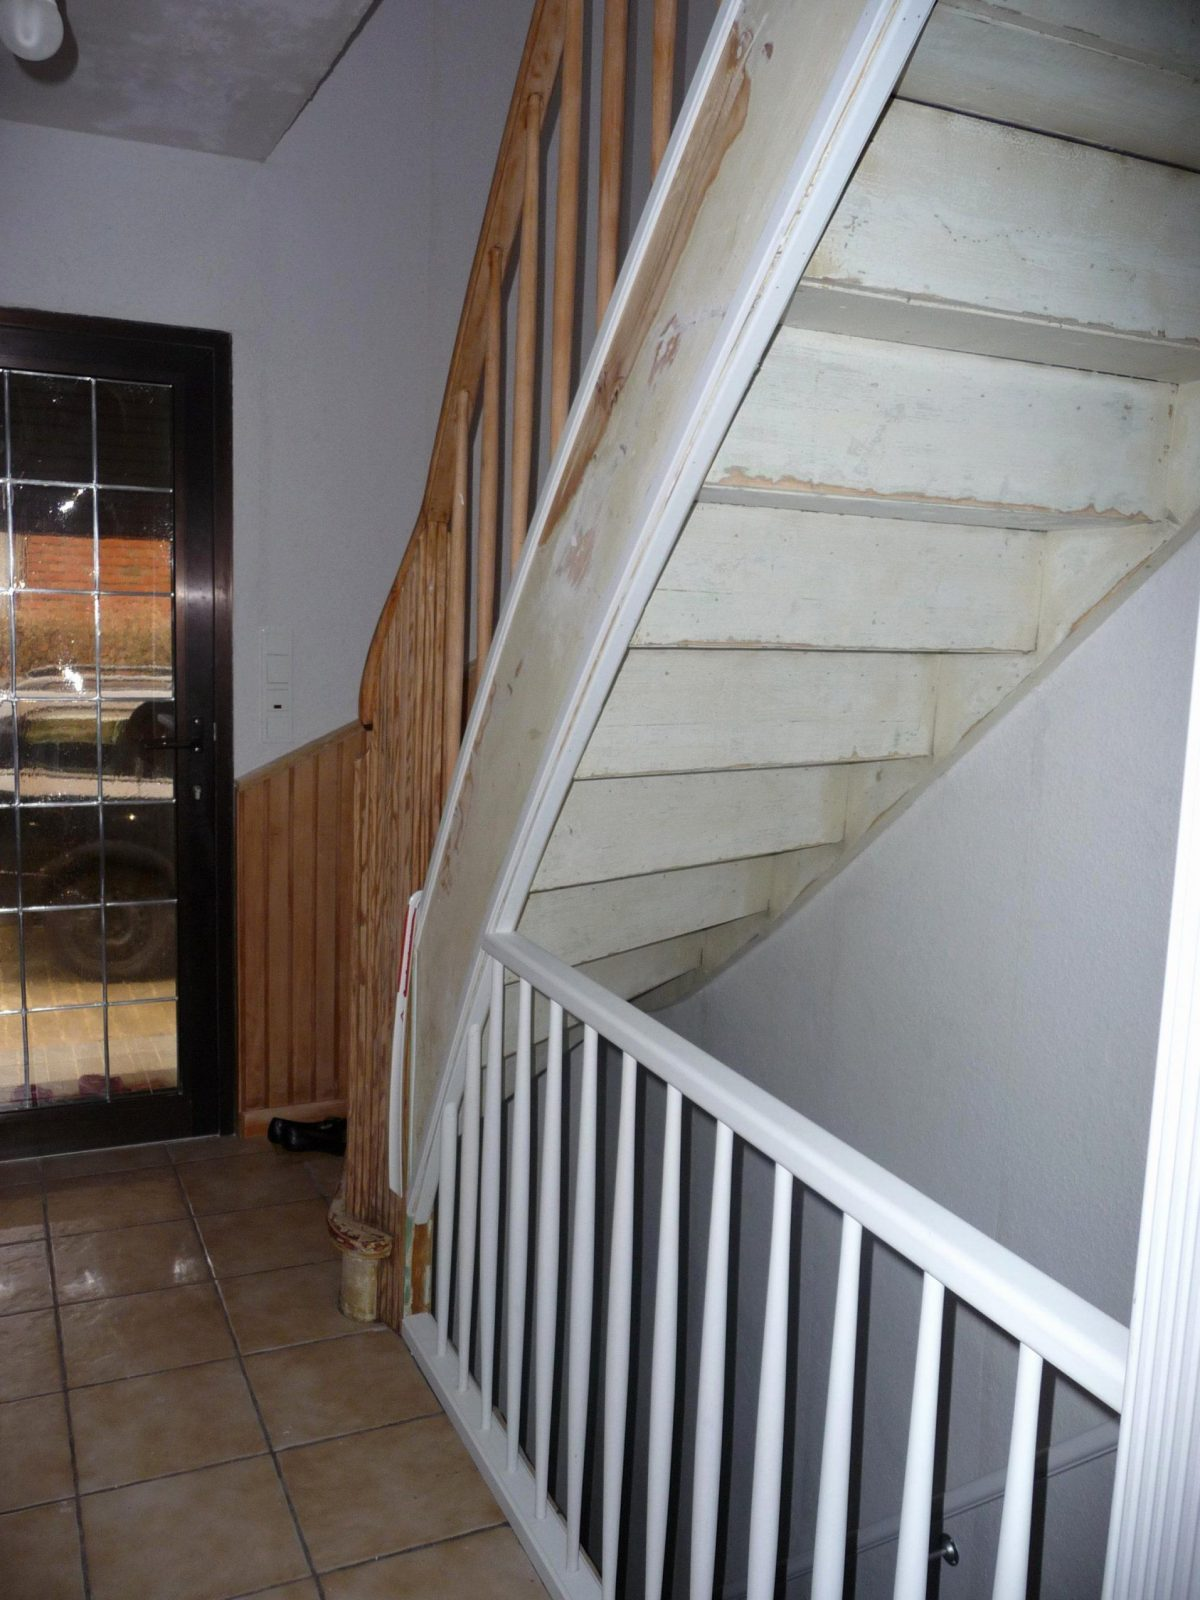 Alte Holztreppe Neu Gestalten Genial Emejing Alte Treppen Neu von Alte Treppen Neu Gestalten Photo